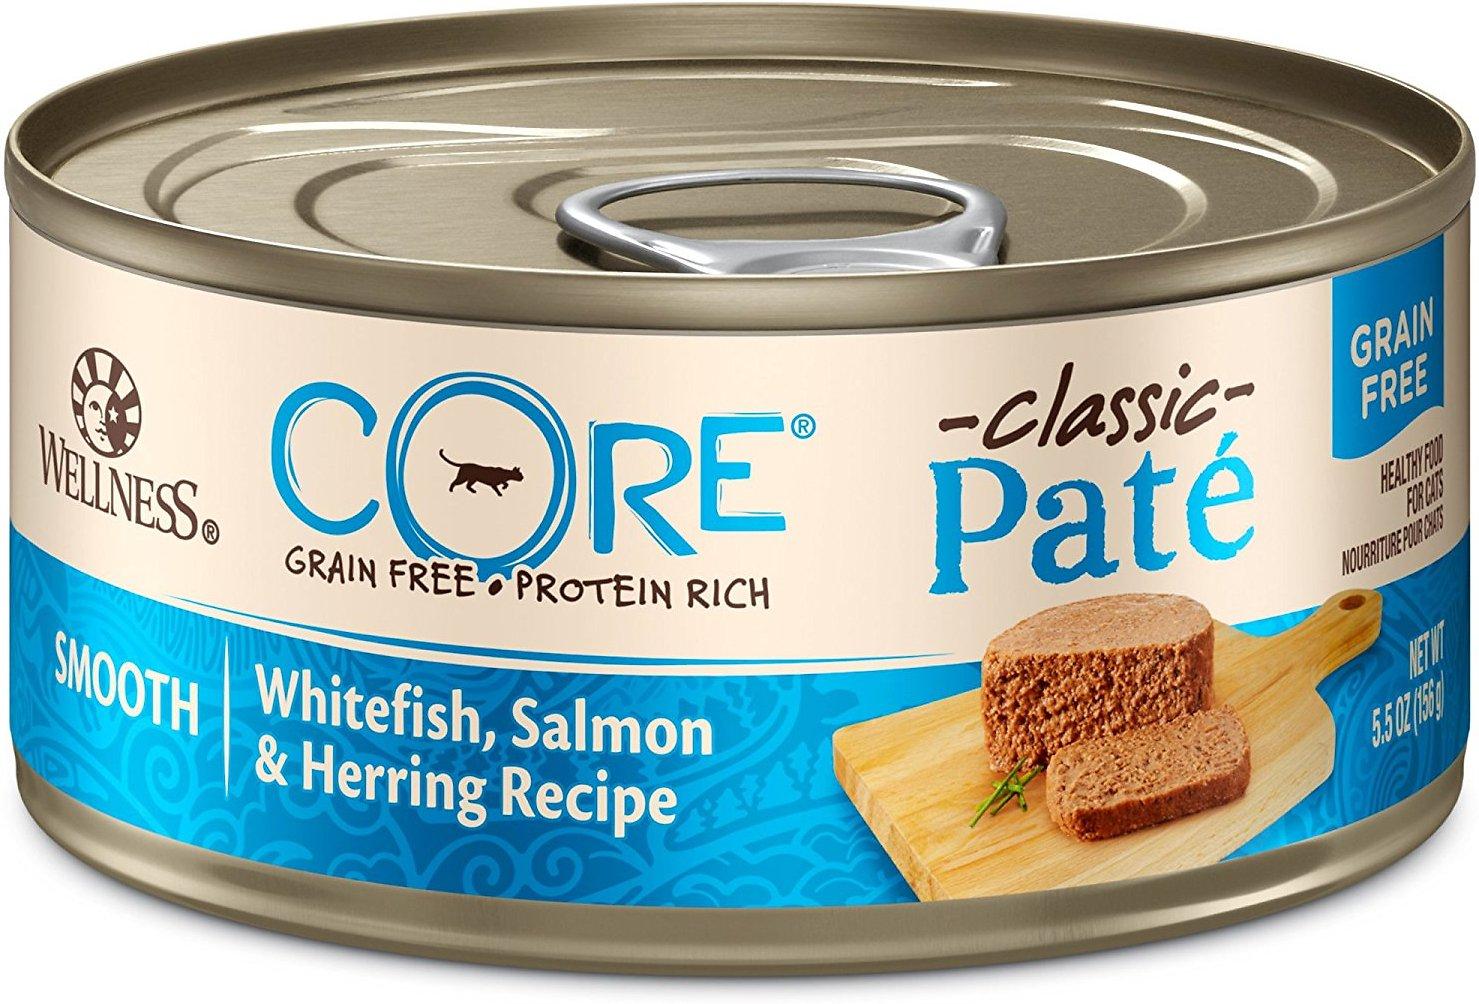 Wellness CORE Grain-Free Salmon, Whitefish & Herring Formula Canned Kitten & Cat Food, 5.5-oz